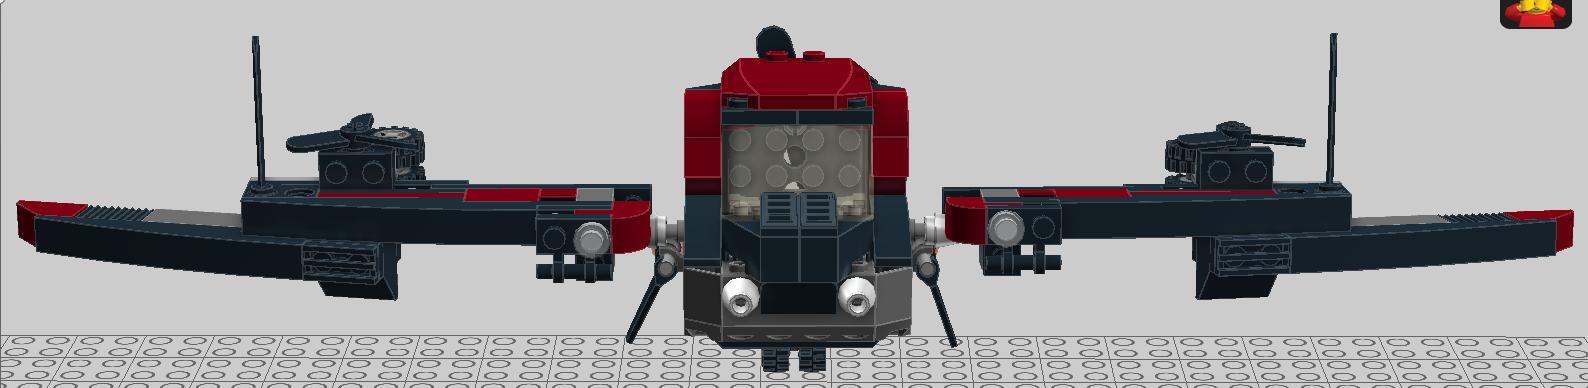 Transformer_aircraft.jpg